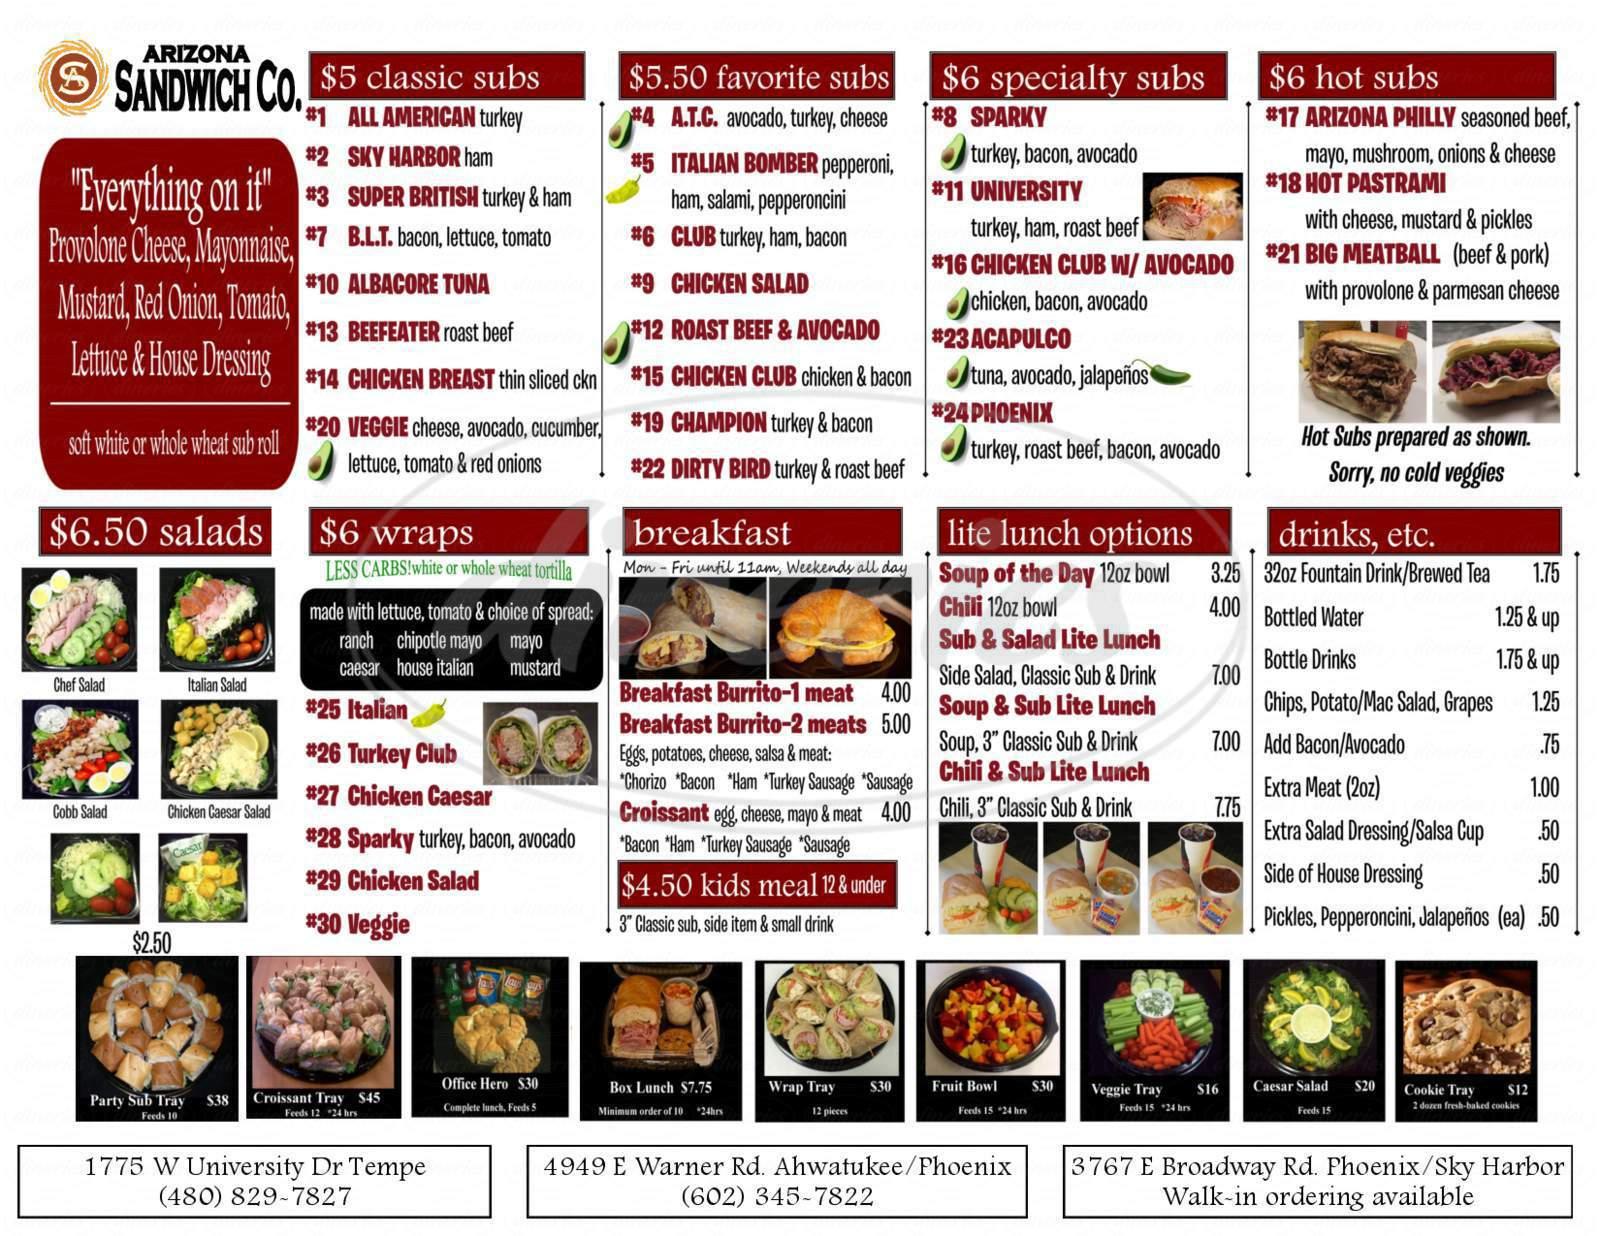 menu for Arizona Sandwich Co